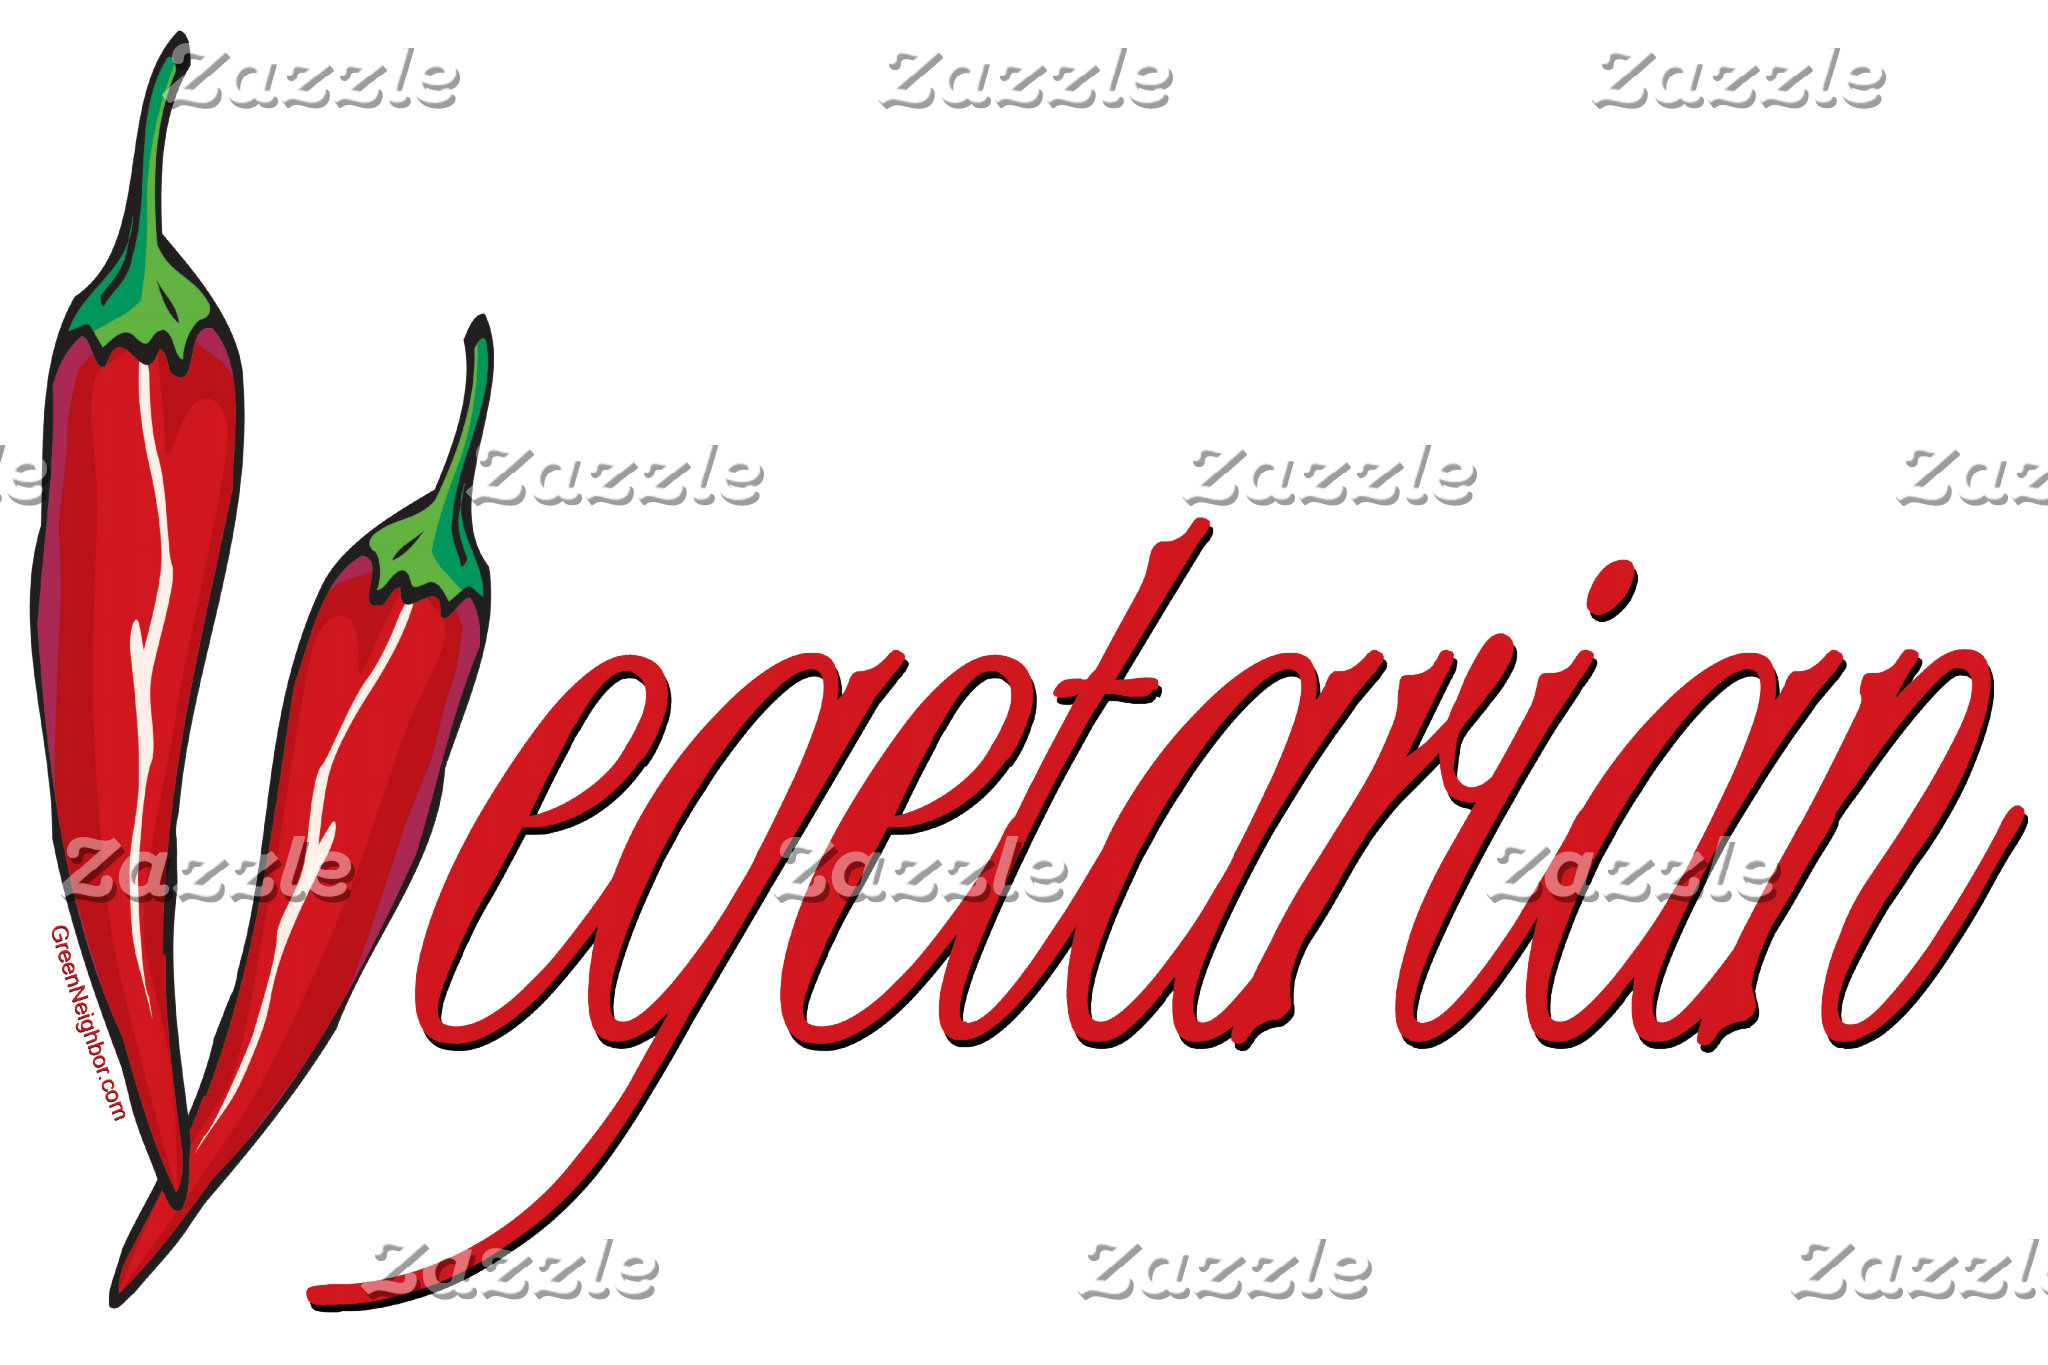 Hot Chili Pepper Vegetarian